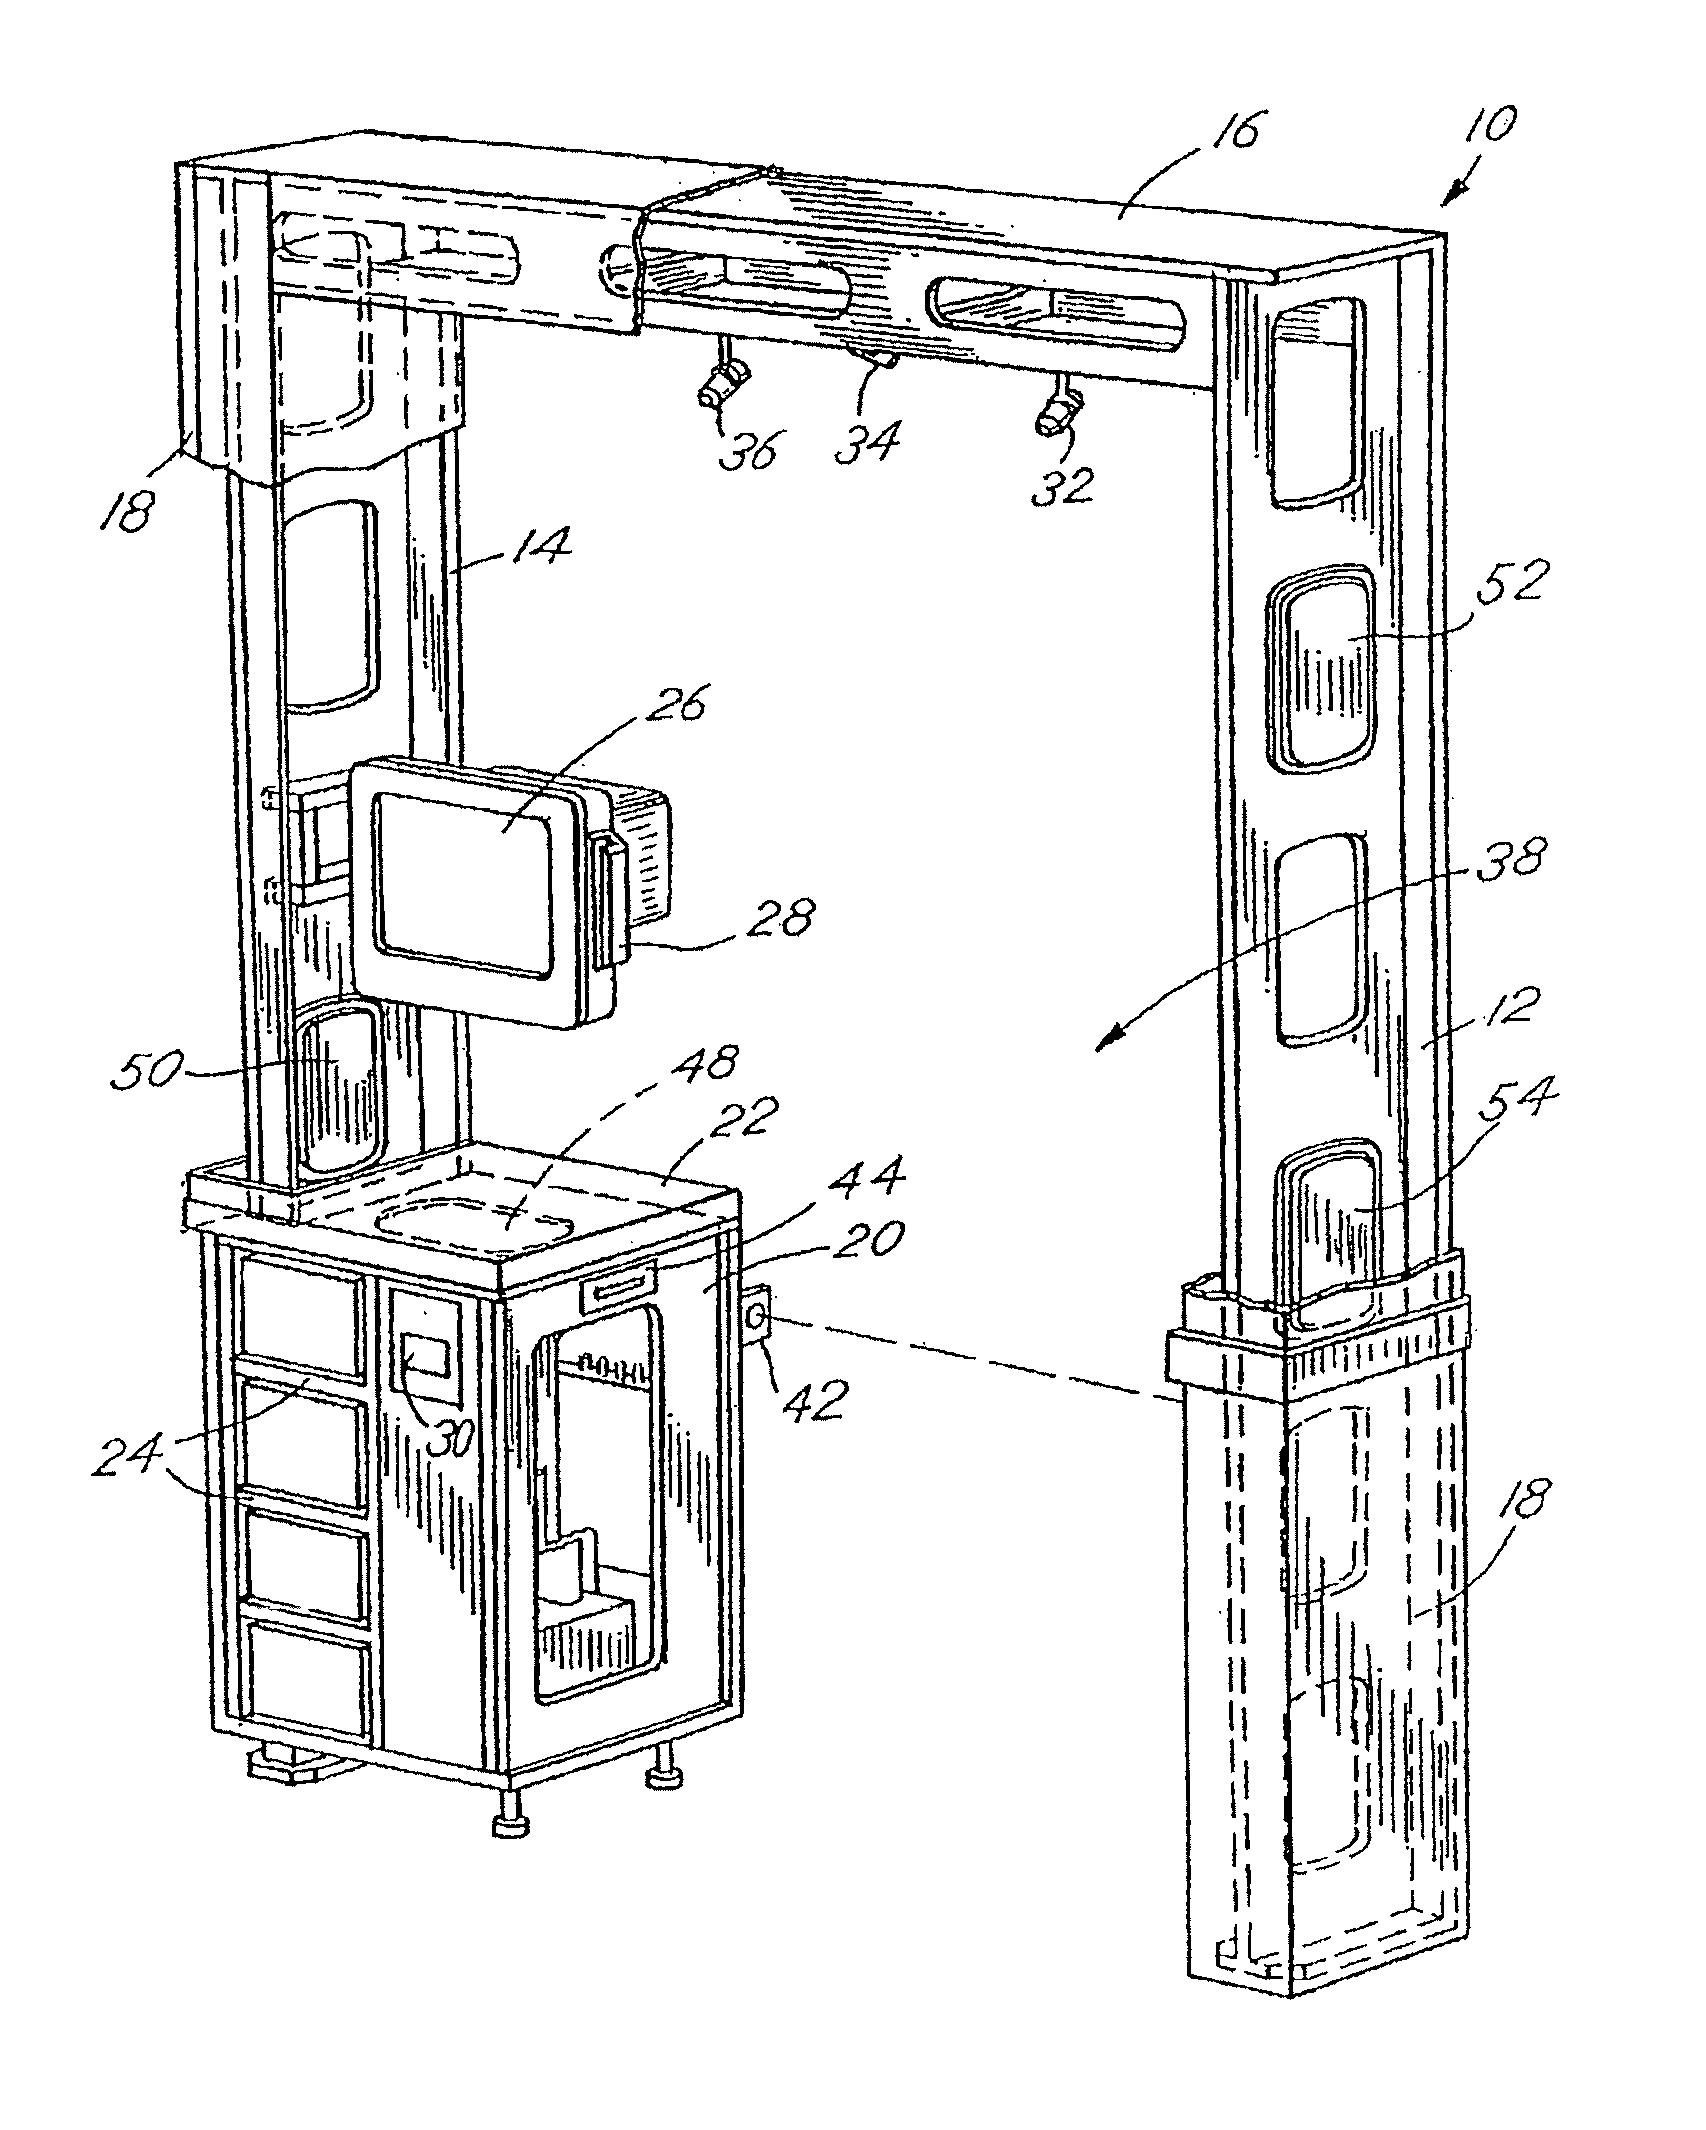 Patent US 9,864,971 B2